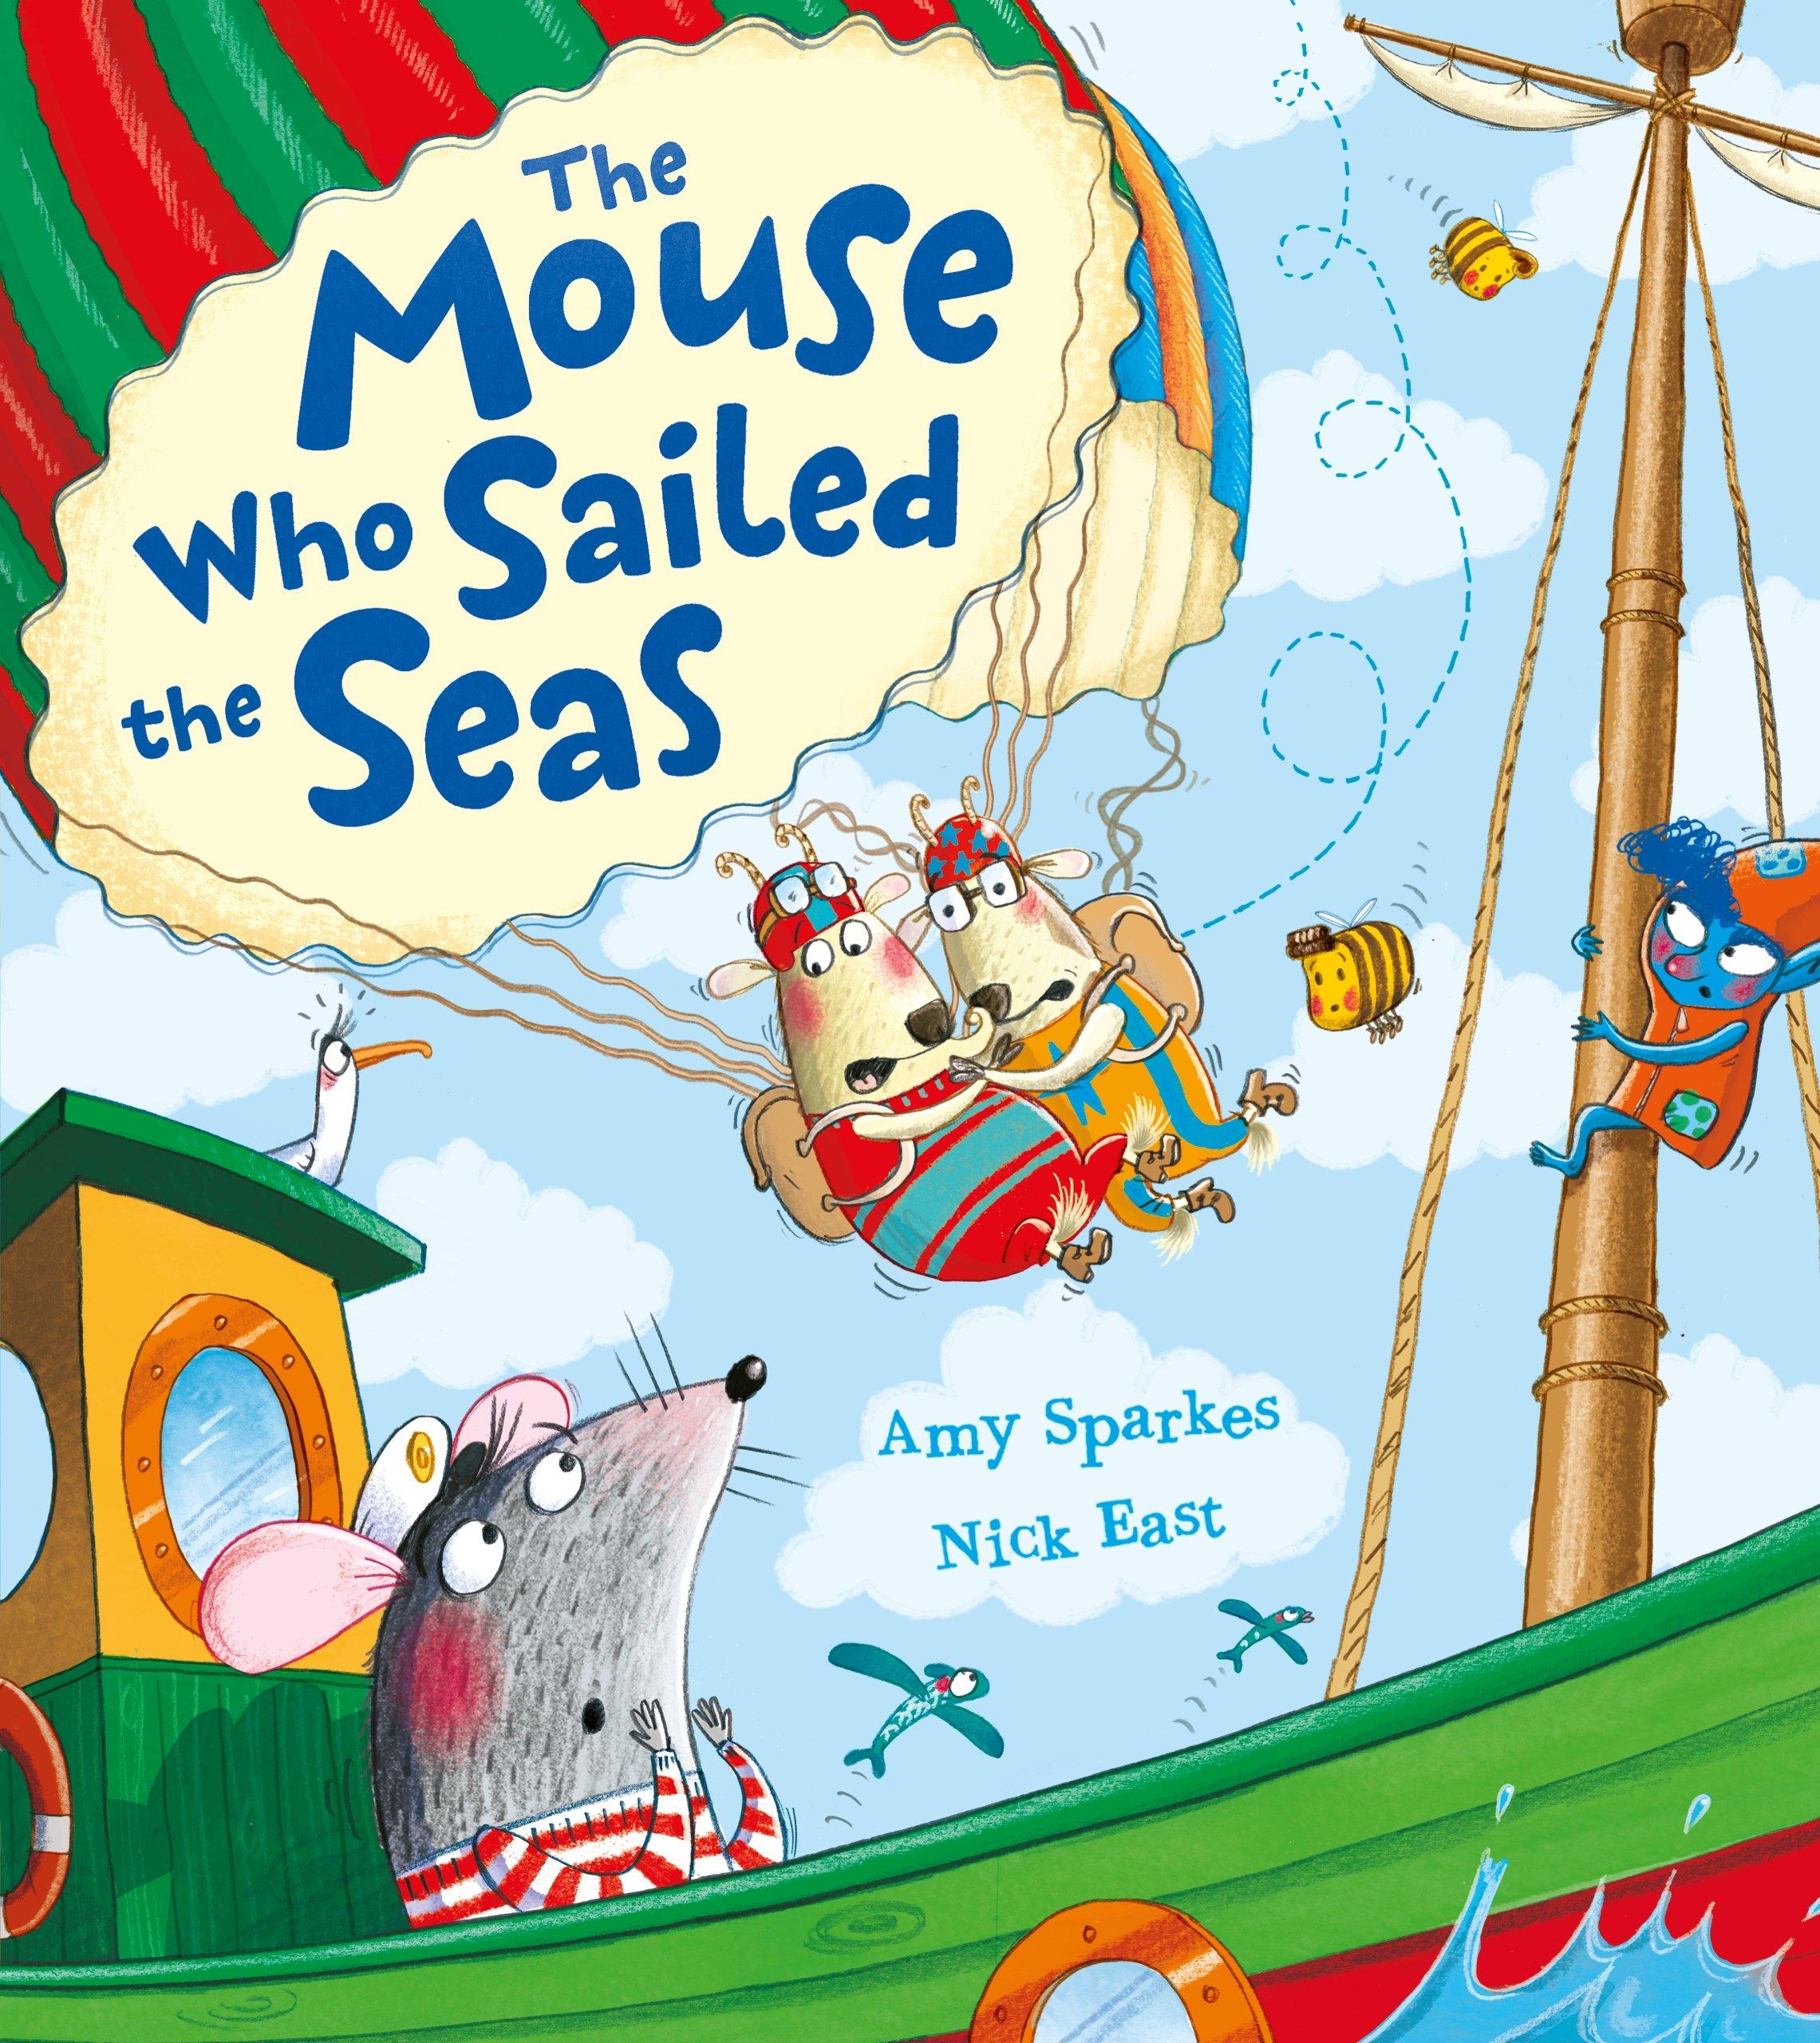 The Mouse Who Sailed the Seas: Amazon.co.uk: Amy Sparkes, Nick East:  9781405273787: Books